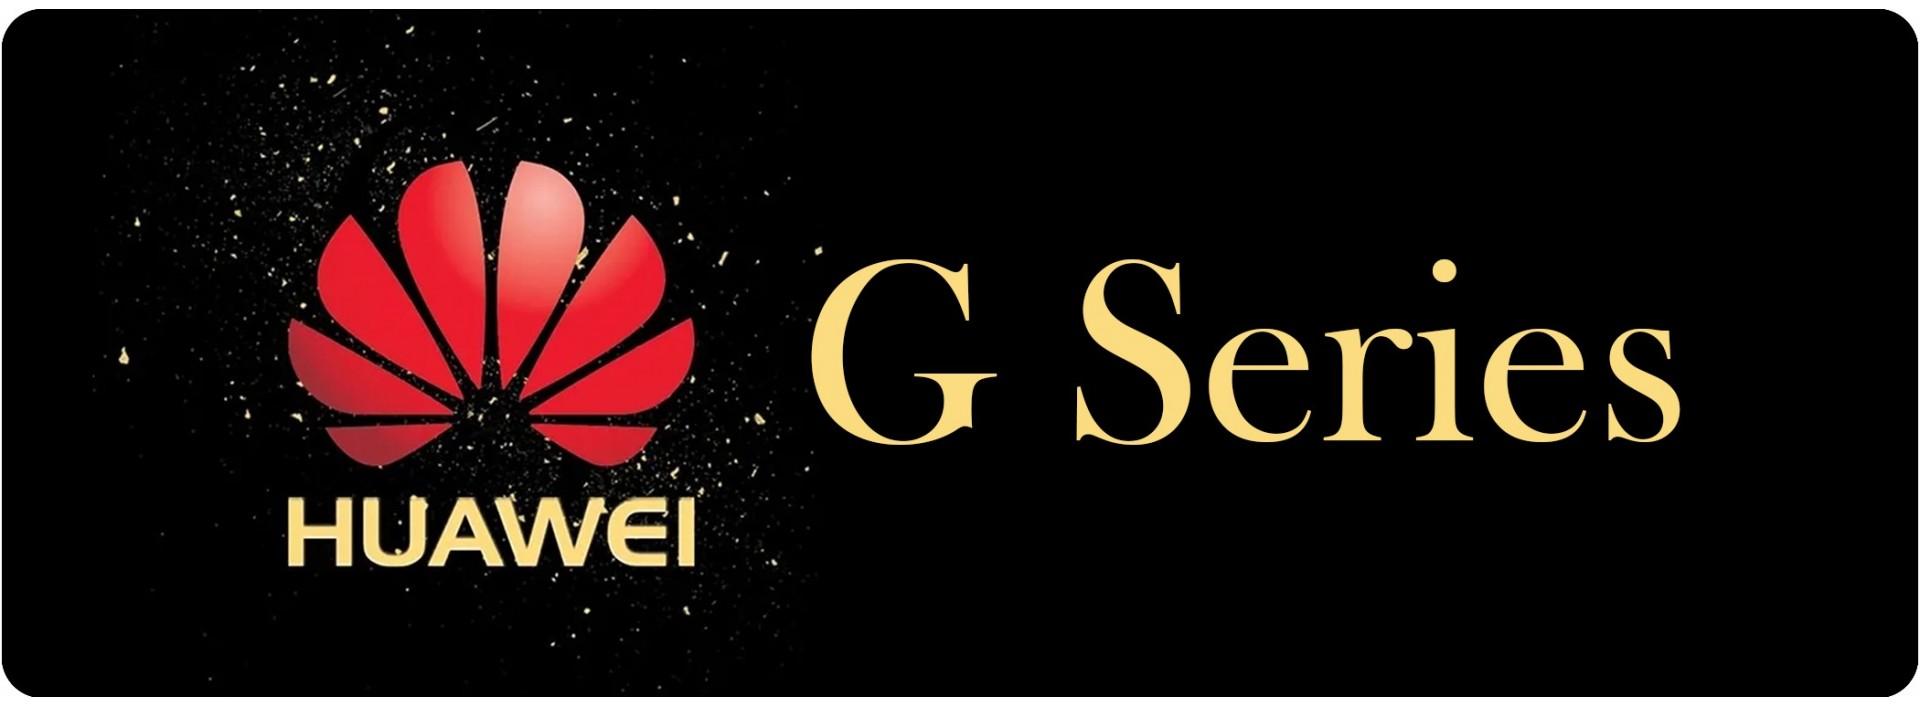 Fundas para Huawei Serie G